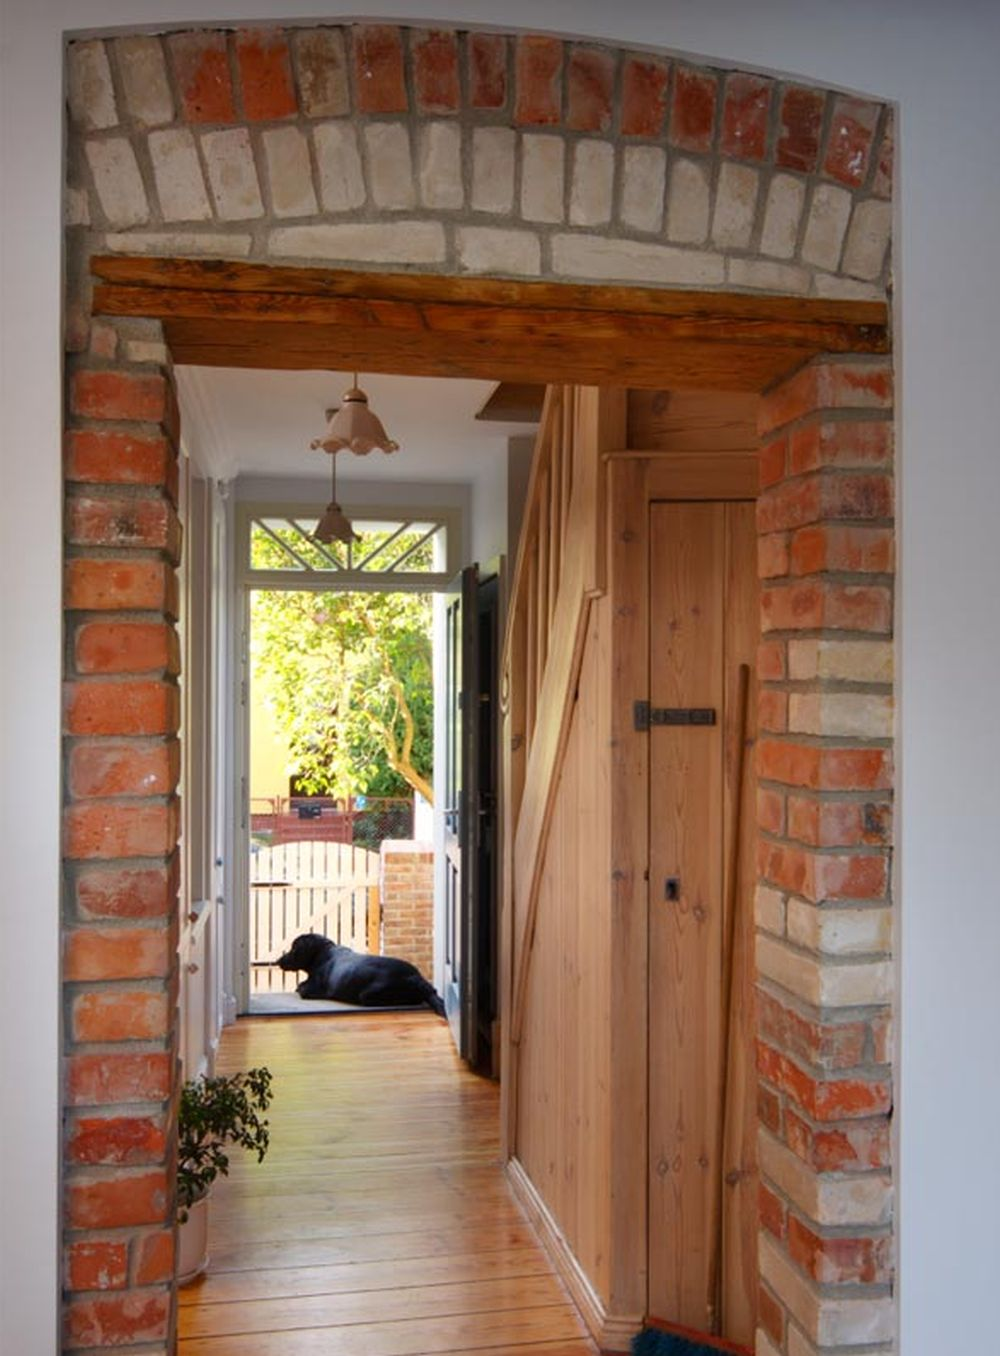 adelaparvu.com despre casa cu interior in stil englezesc, casa Polonia, design Marta Sikorska, Foto Michal Zalewski (12)